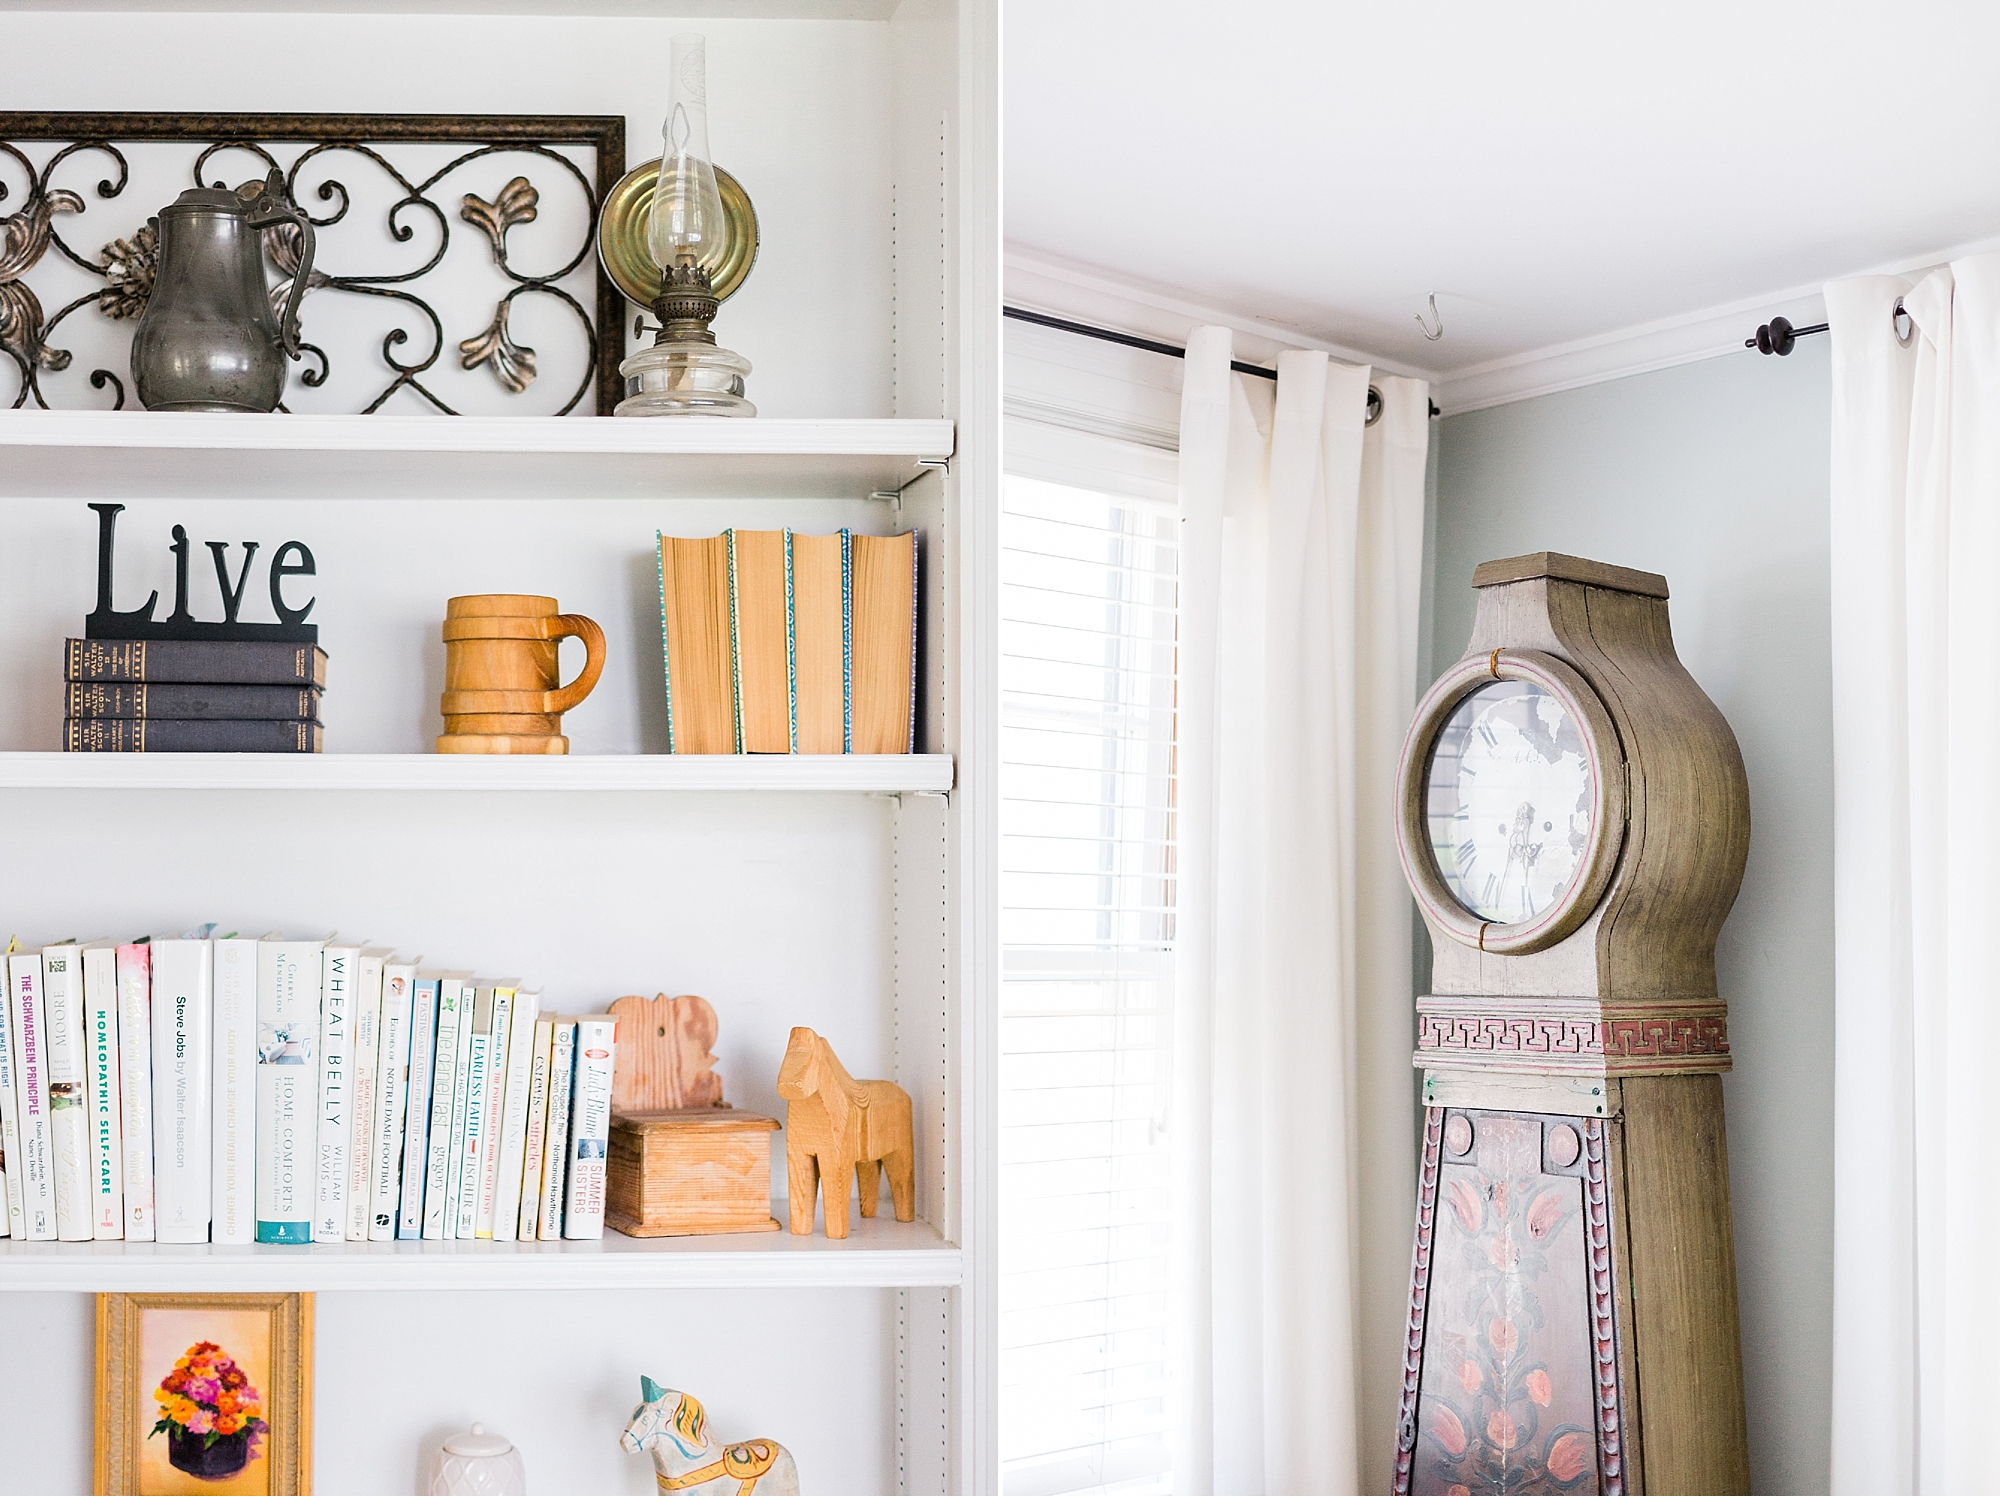 Bookshelf Decor - Antique Clock - New Hampshire Home - Madison Rae Photography